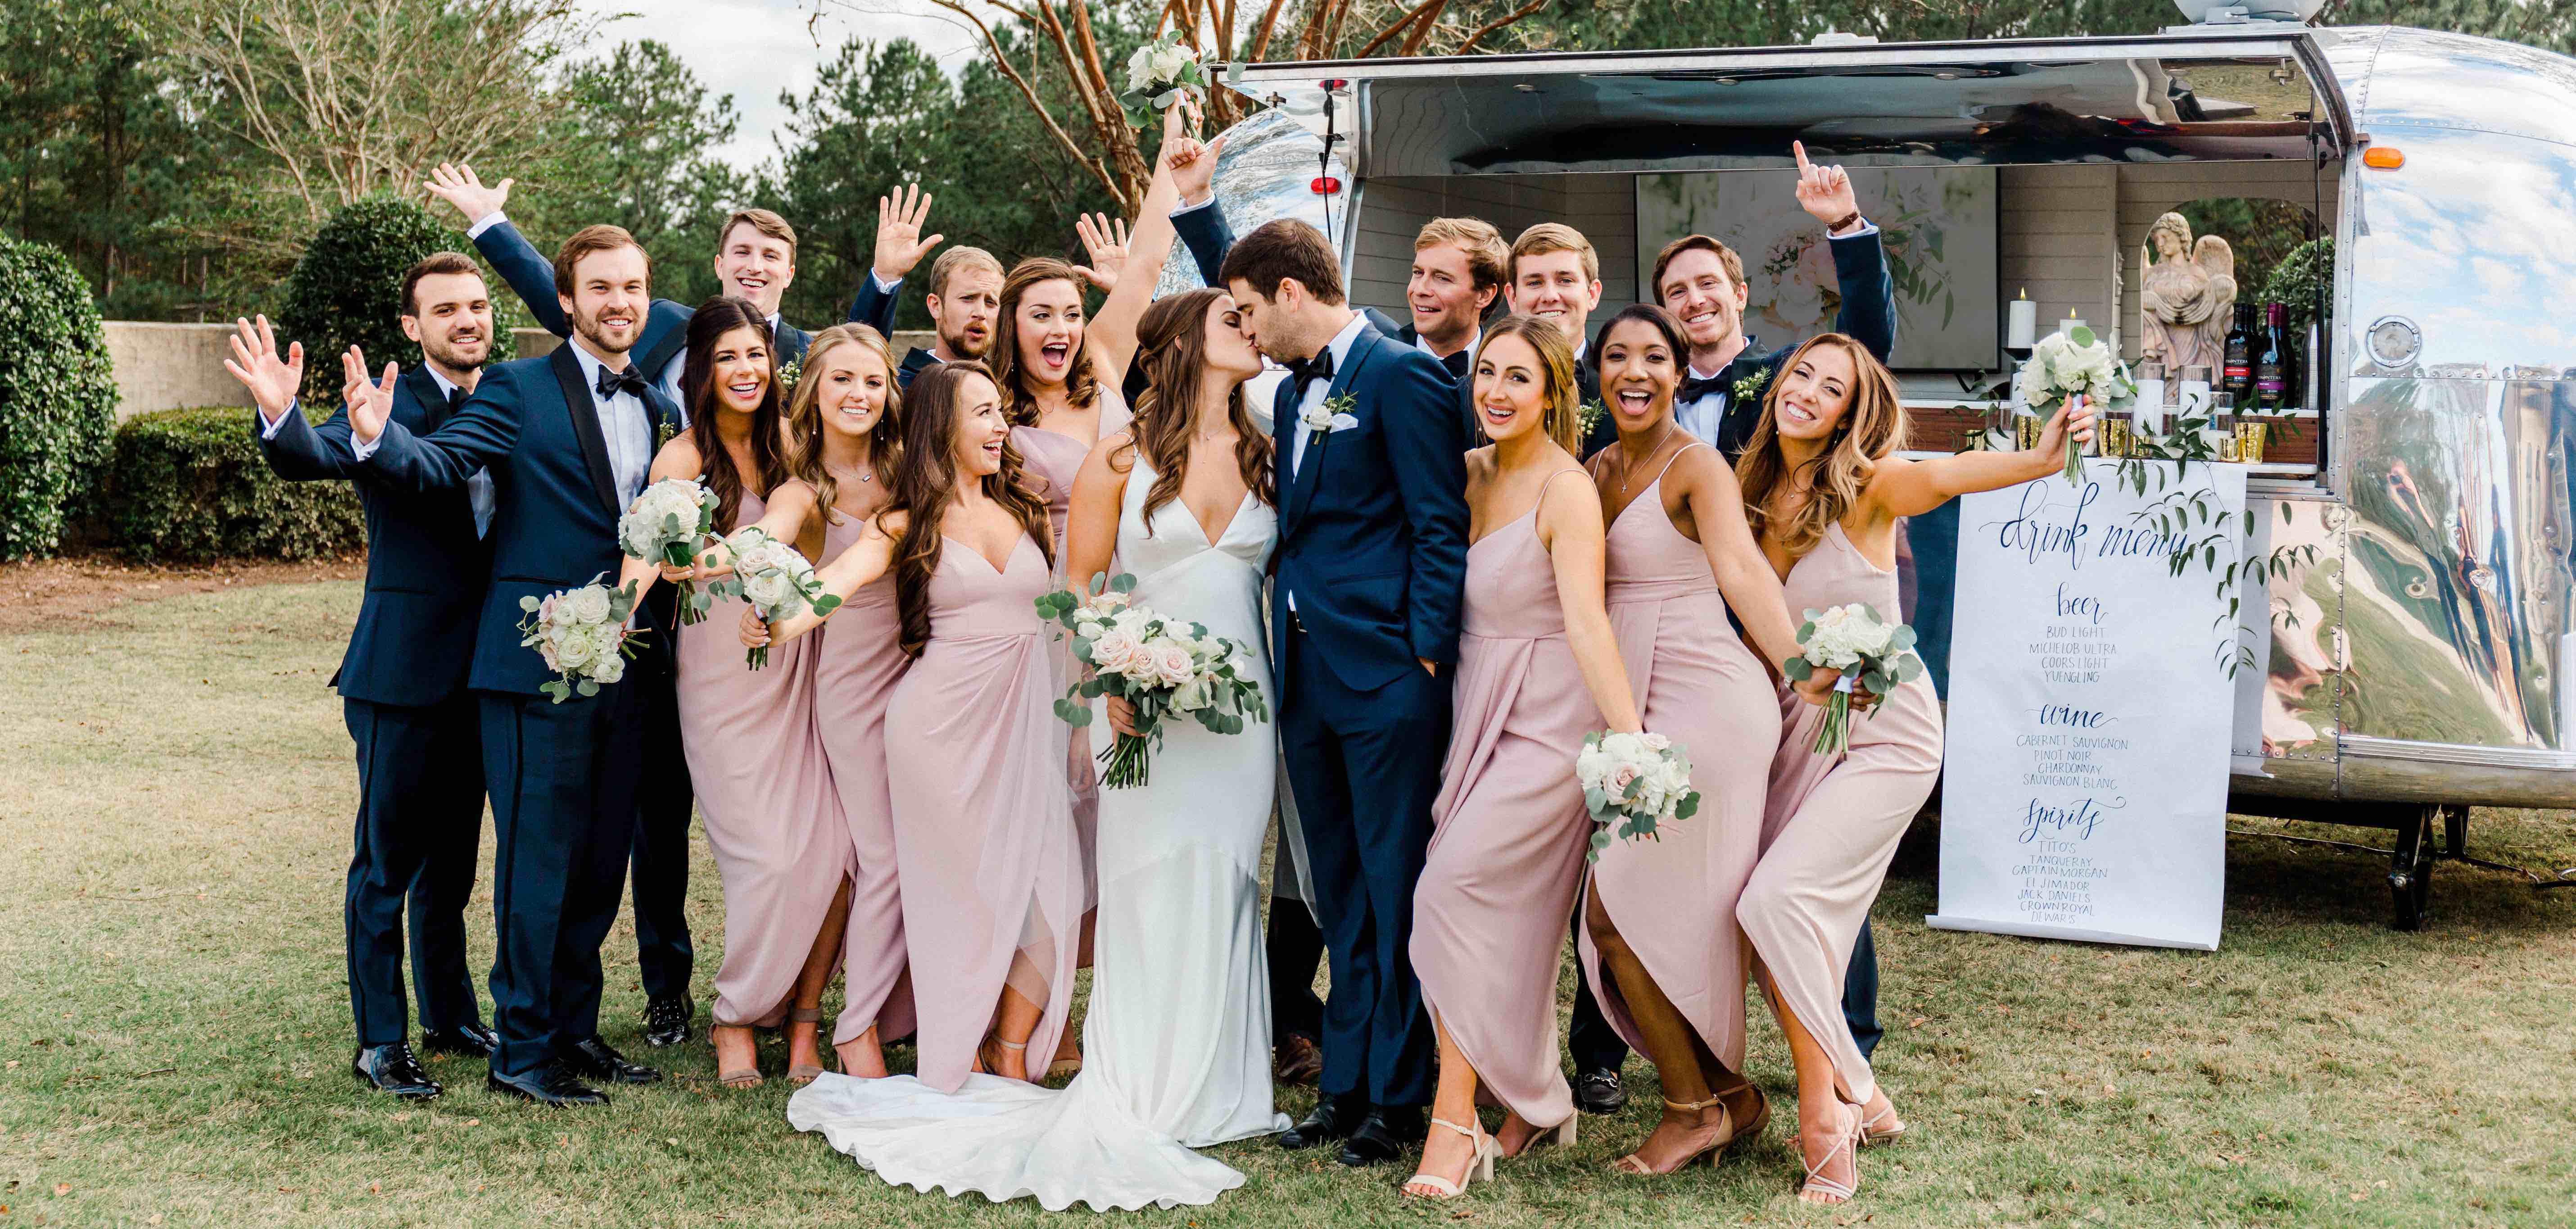 Charleston-South-Carolina-Wedding-Mobile-Bar-Services-Company